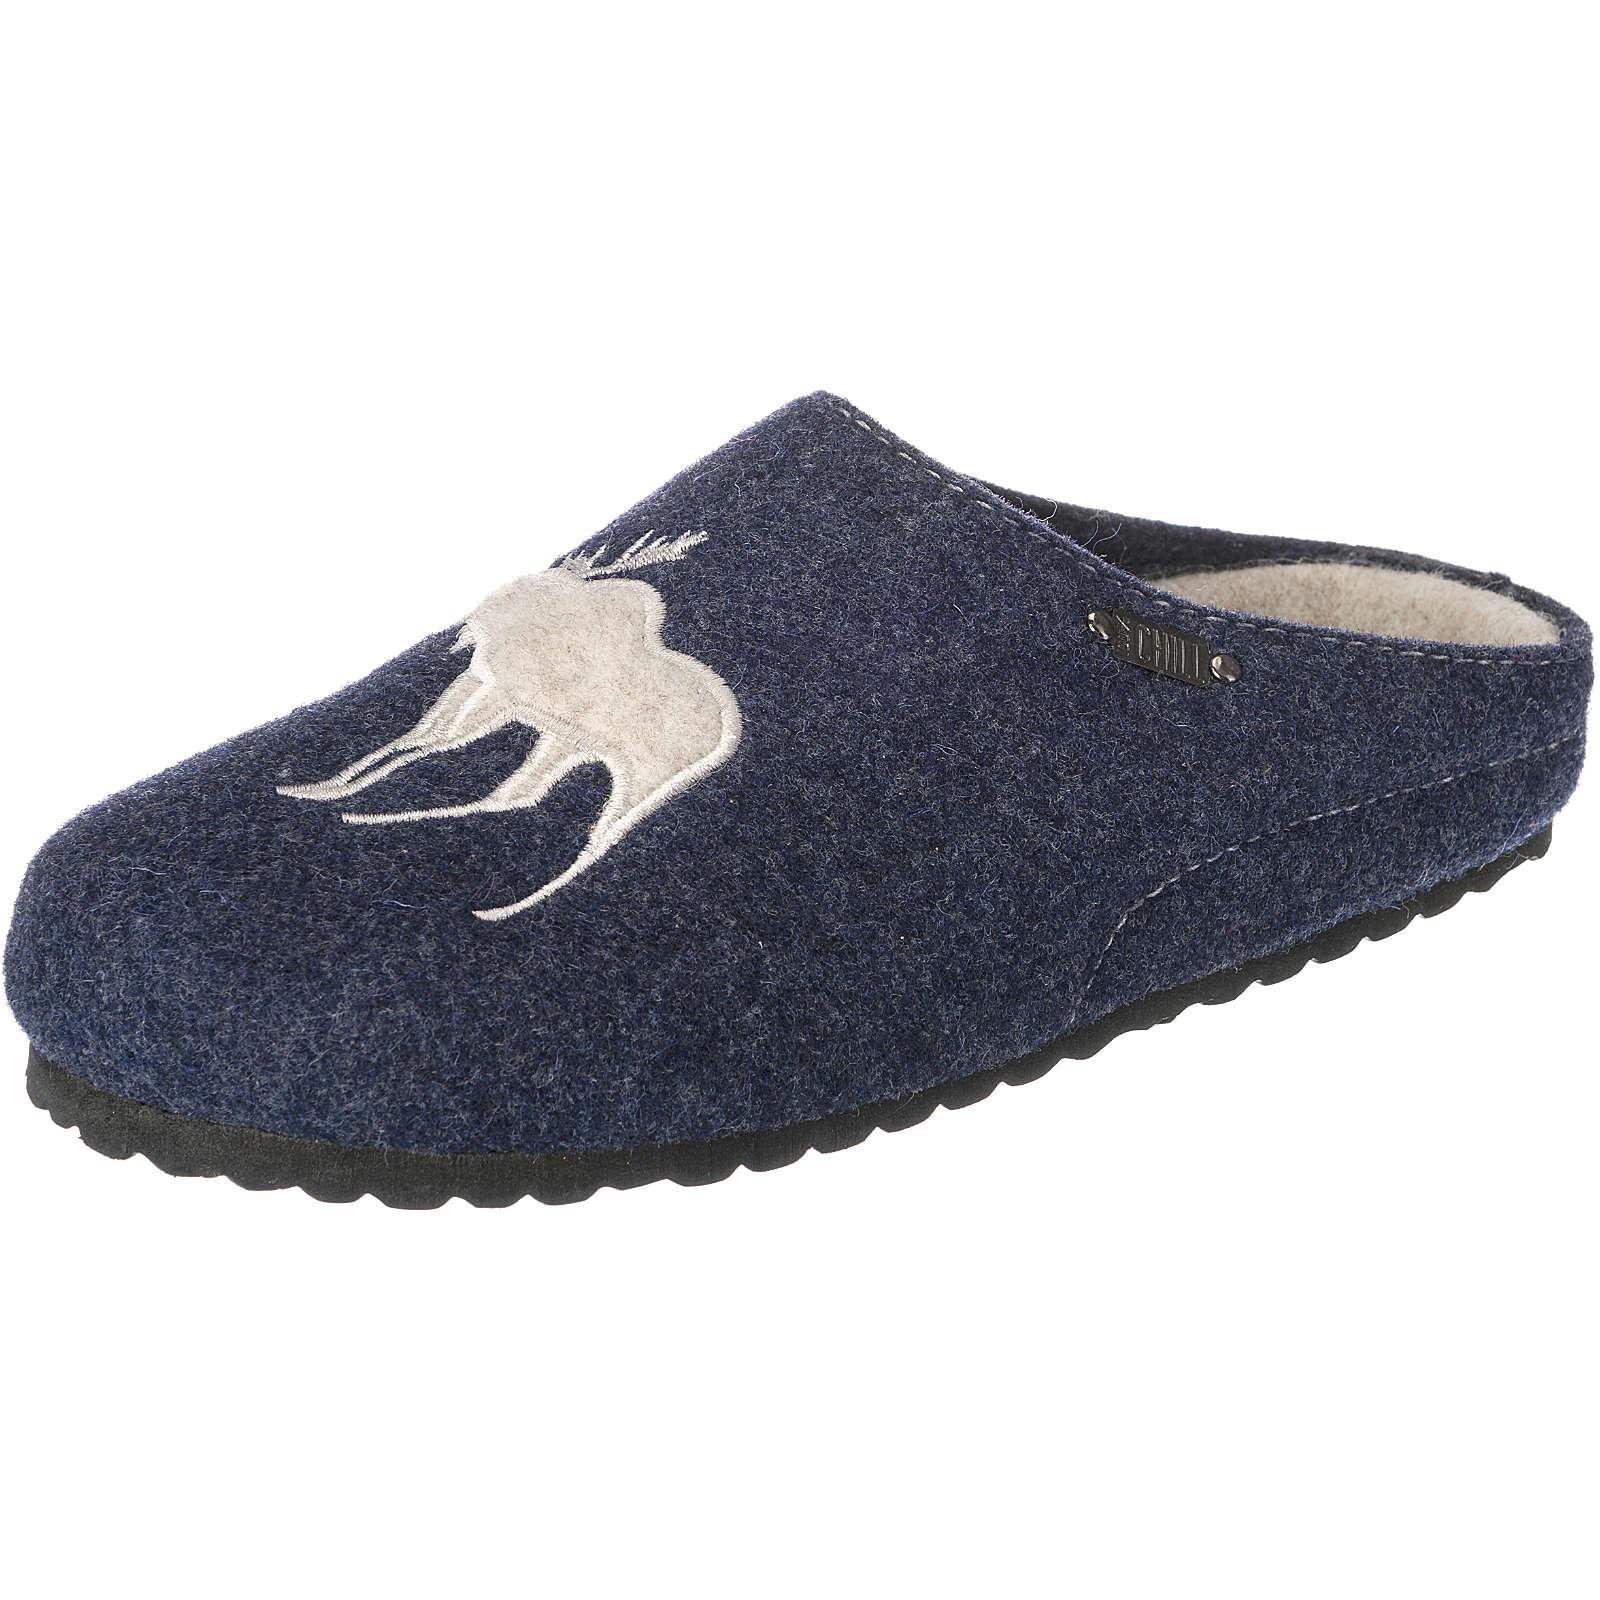 Jane Klain Pantoffeln blau Damen Gr. 38